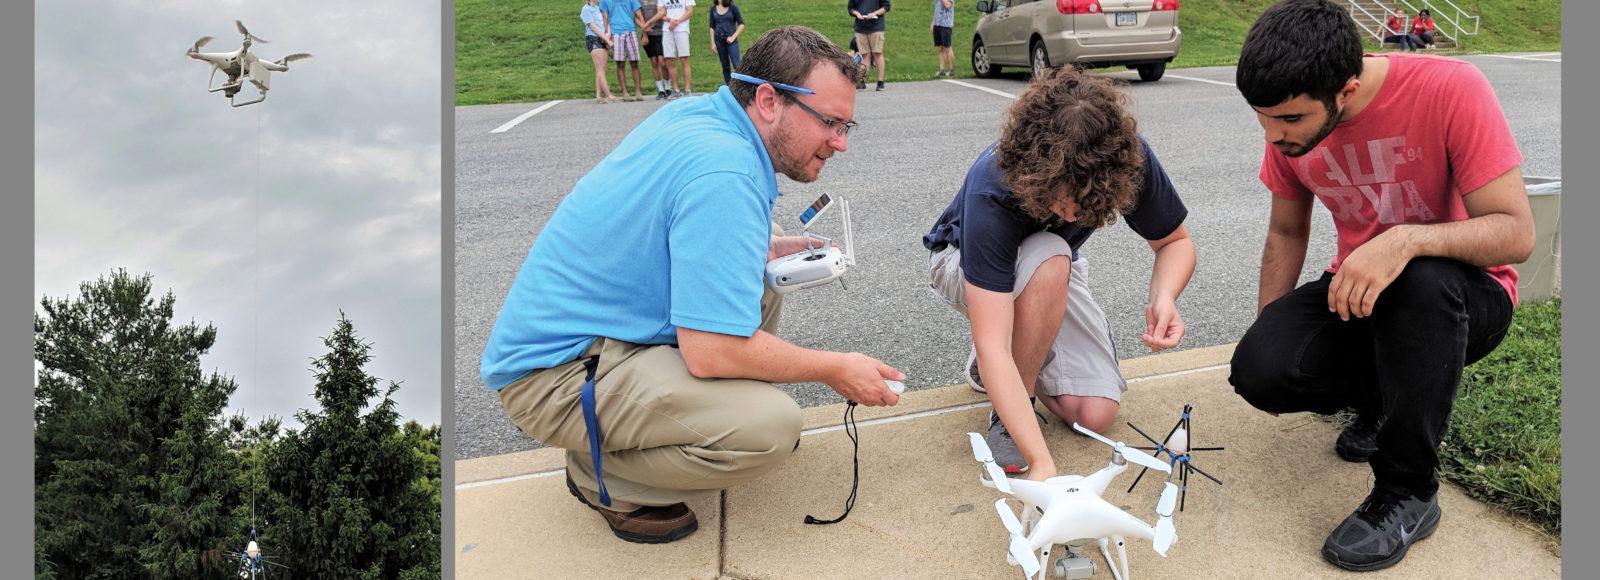 Venture Grants bring drones to Penn Manor HS classrooms